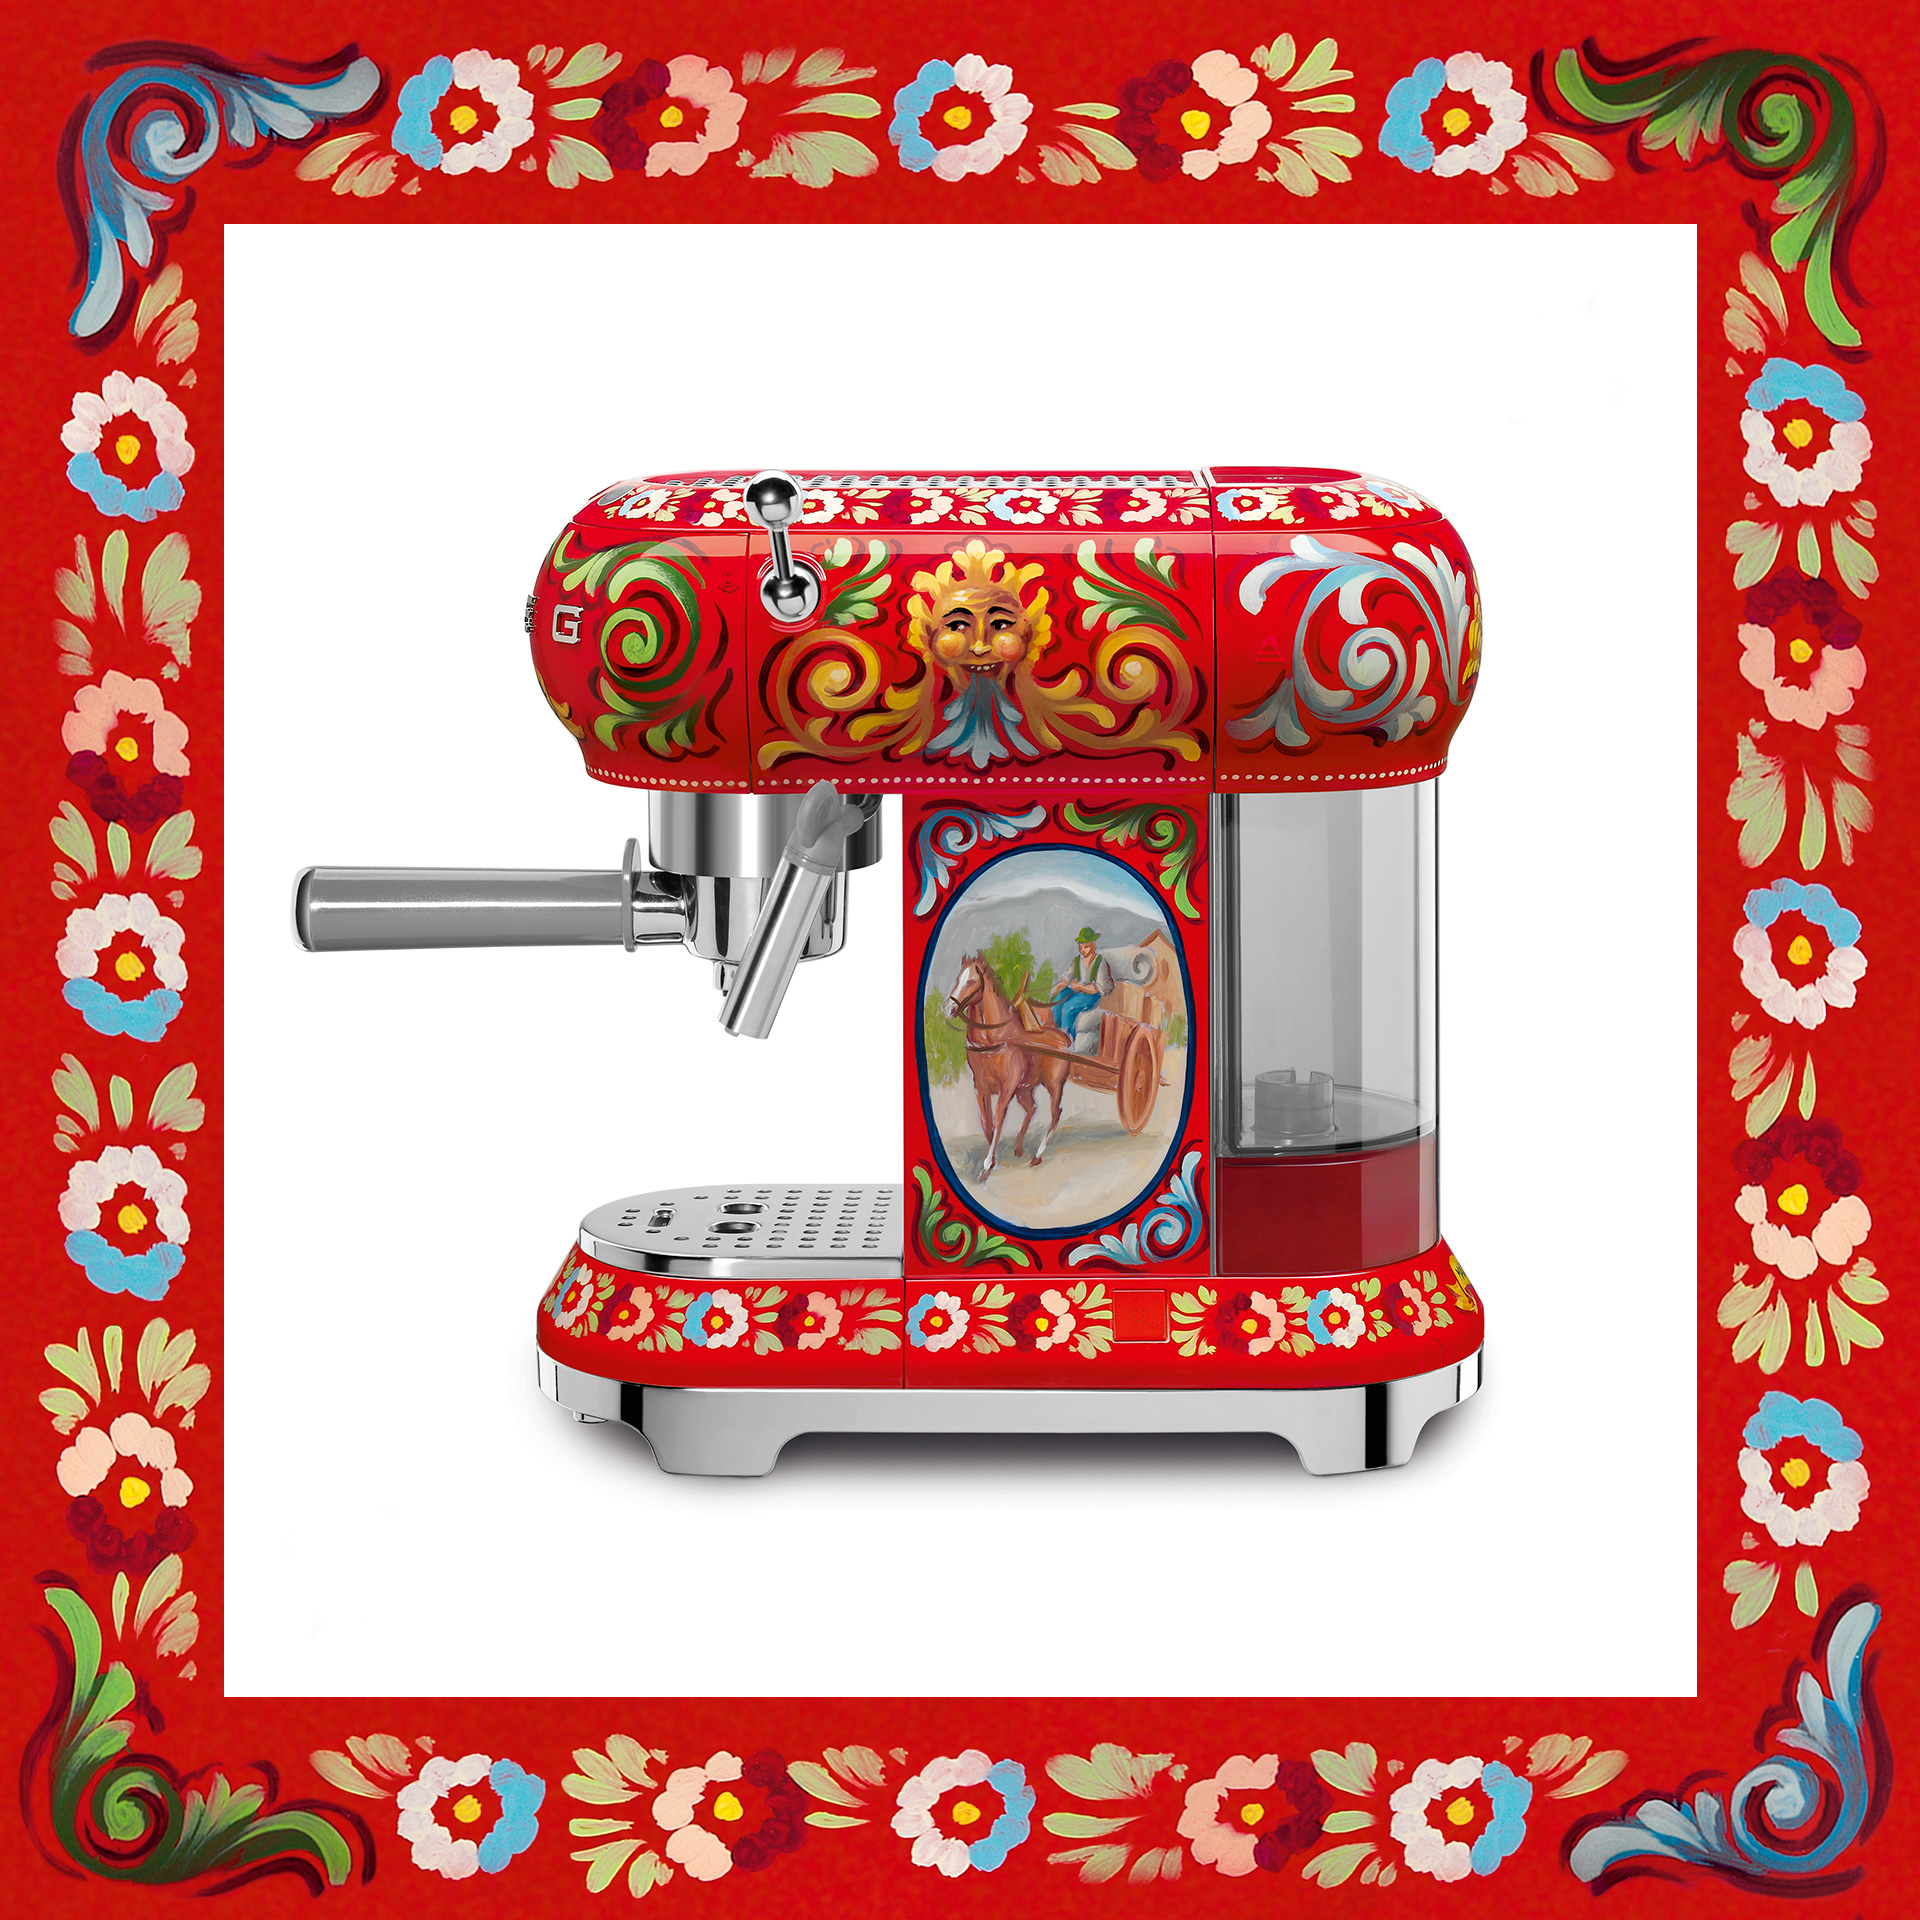 Dolce & Gabbana Diseño Electrodomésticos Smeg